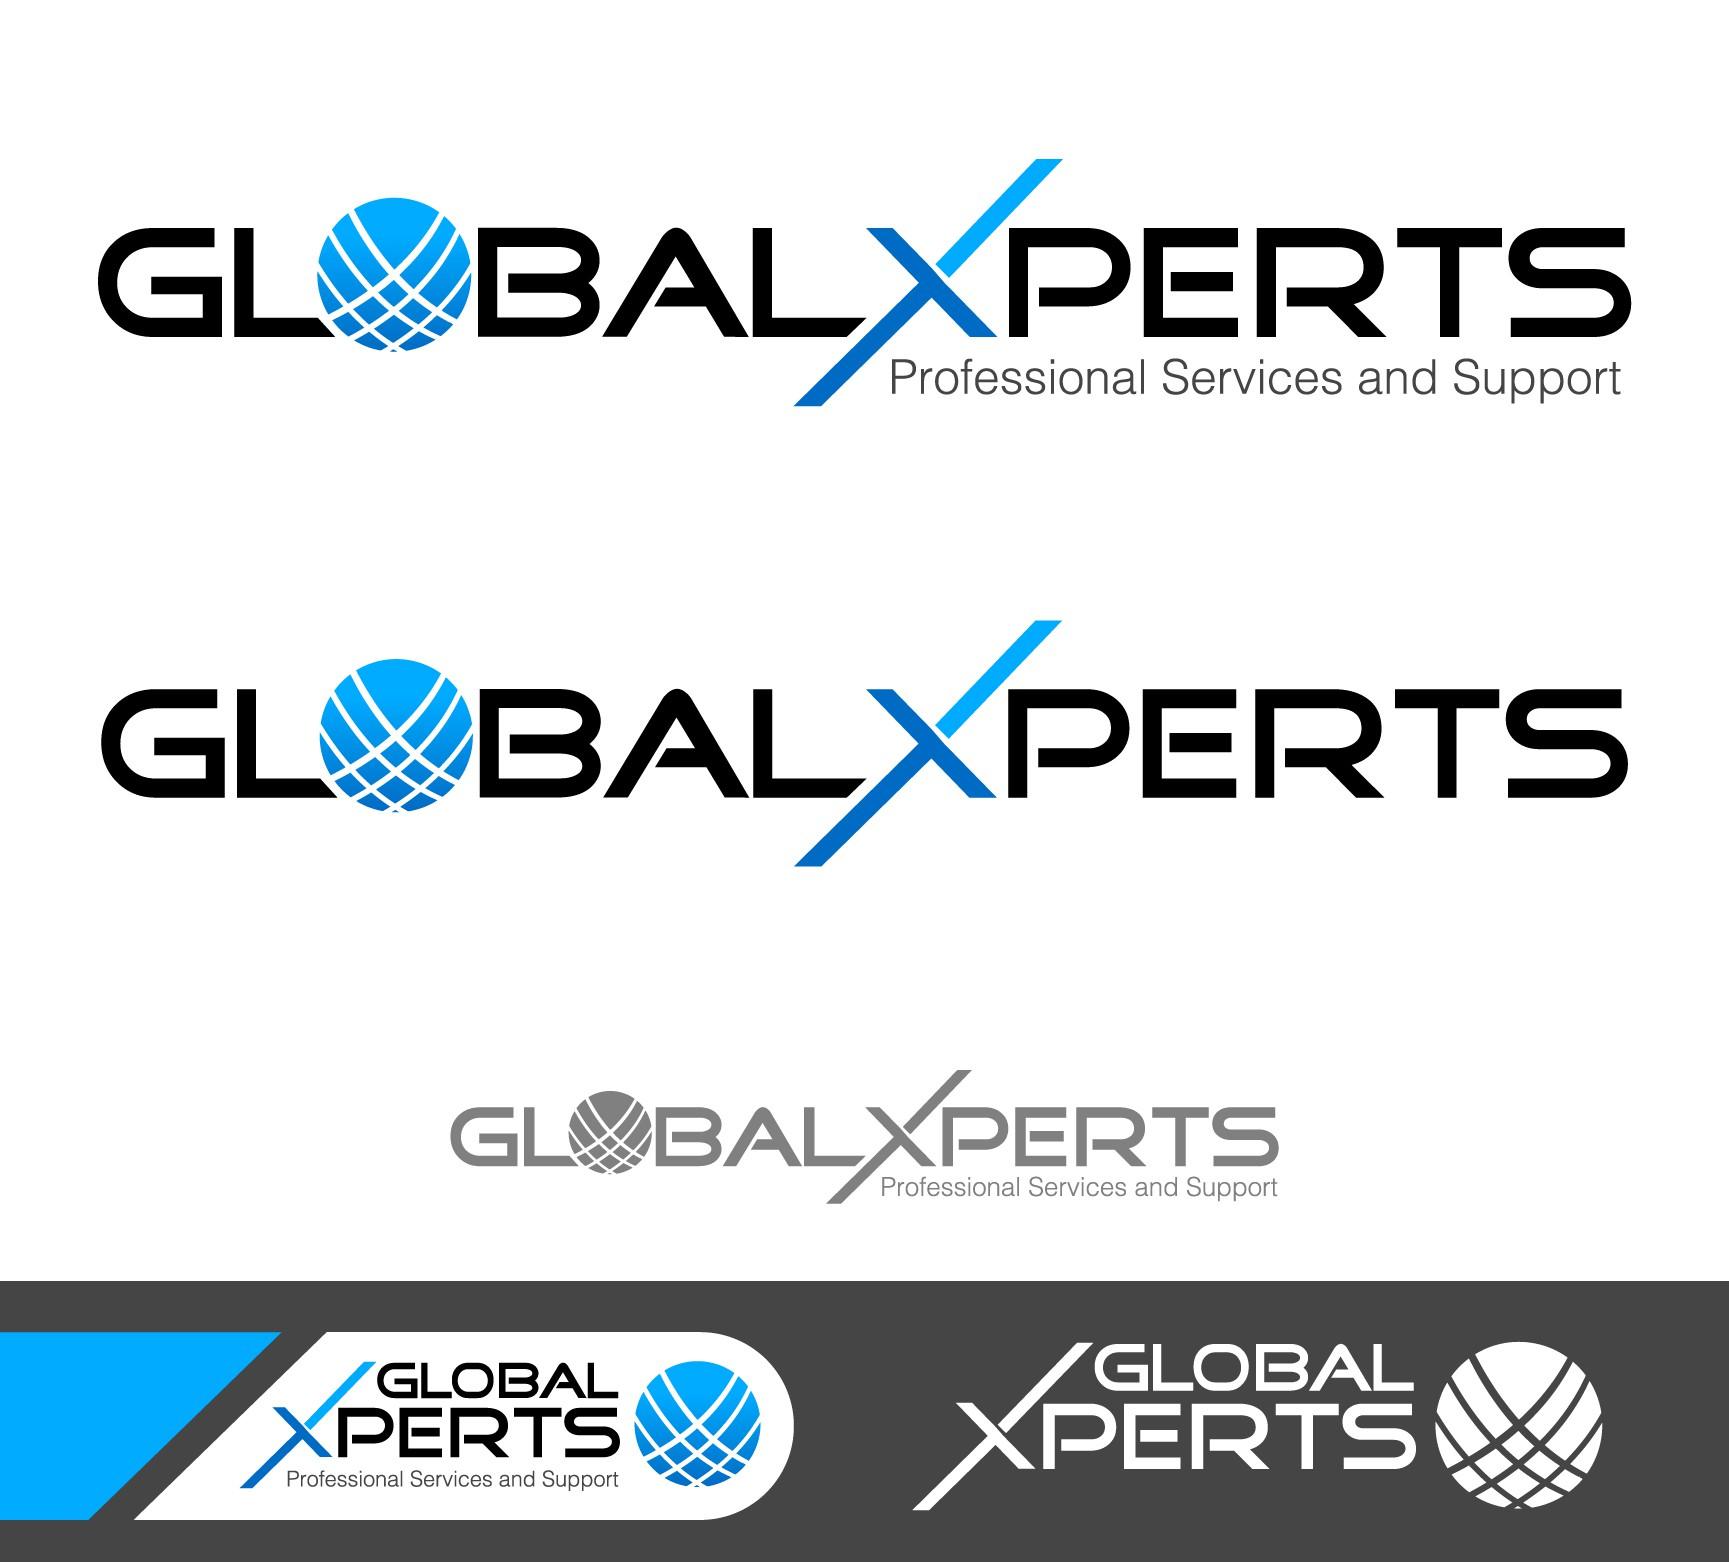 GlobalXperts needs a new logo